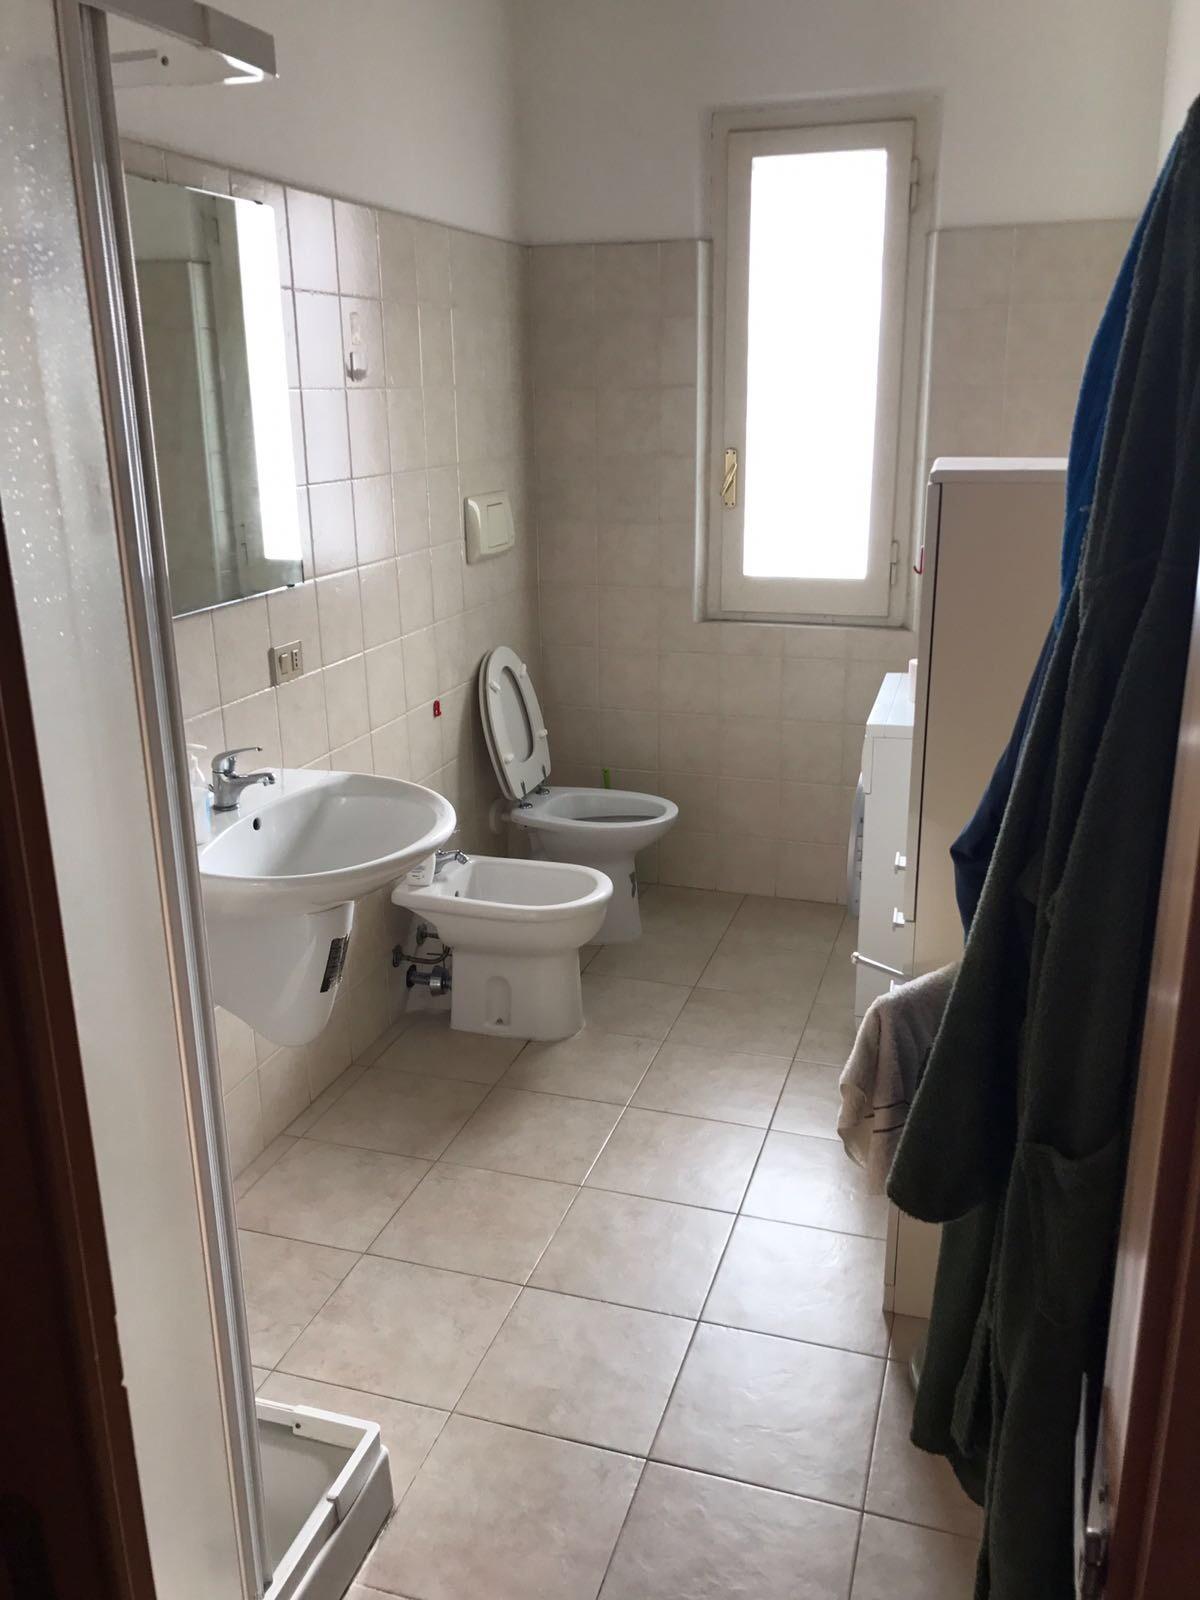 Esempi di bagni ristrutturati ig39 regardsdefemmes Esempi di ristrutturazione appartamento